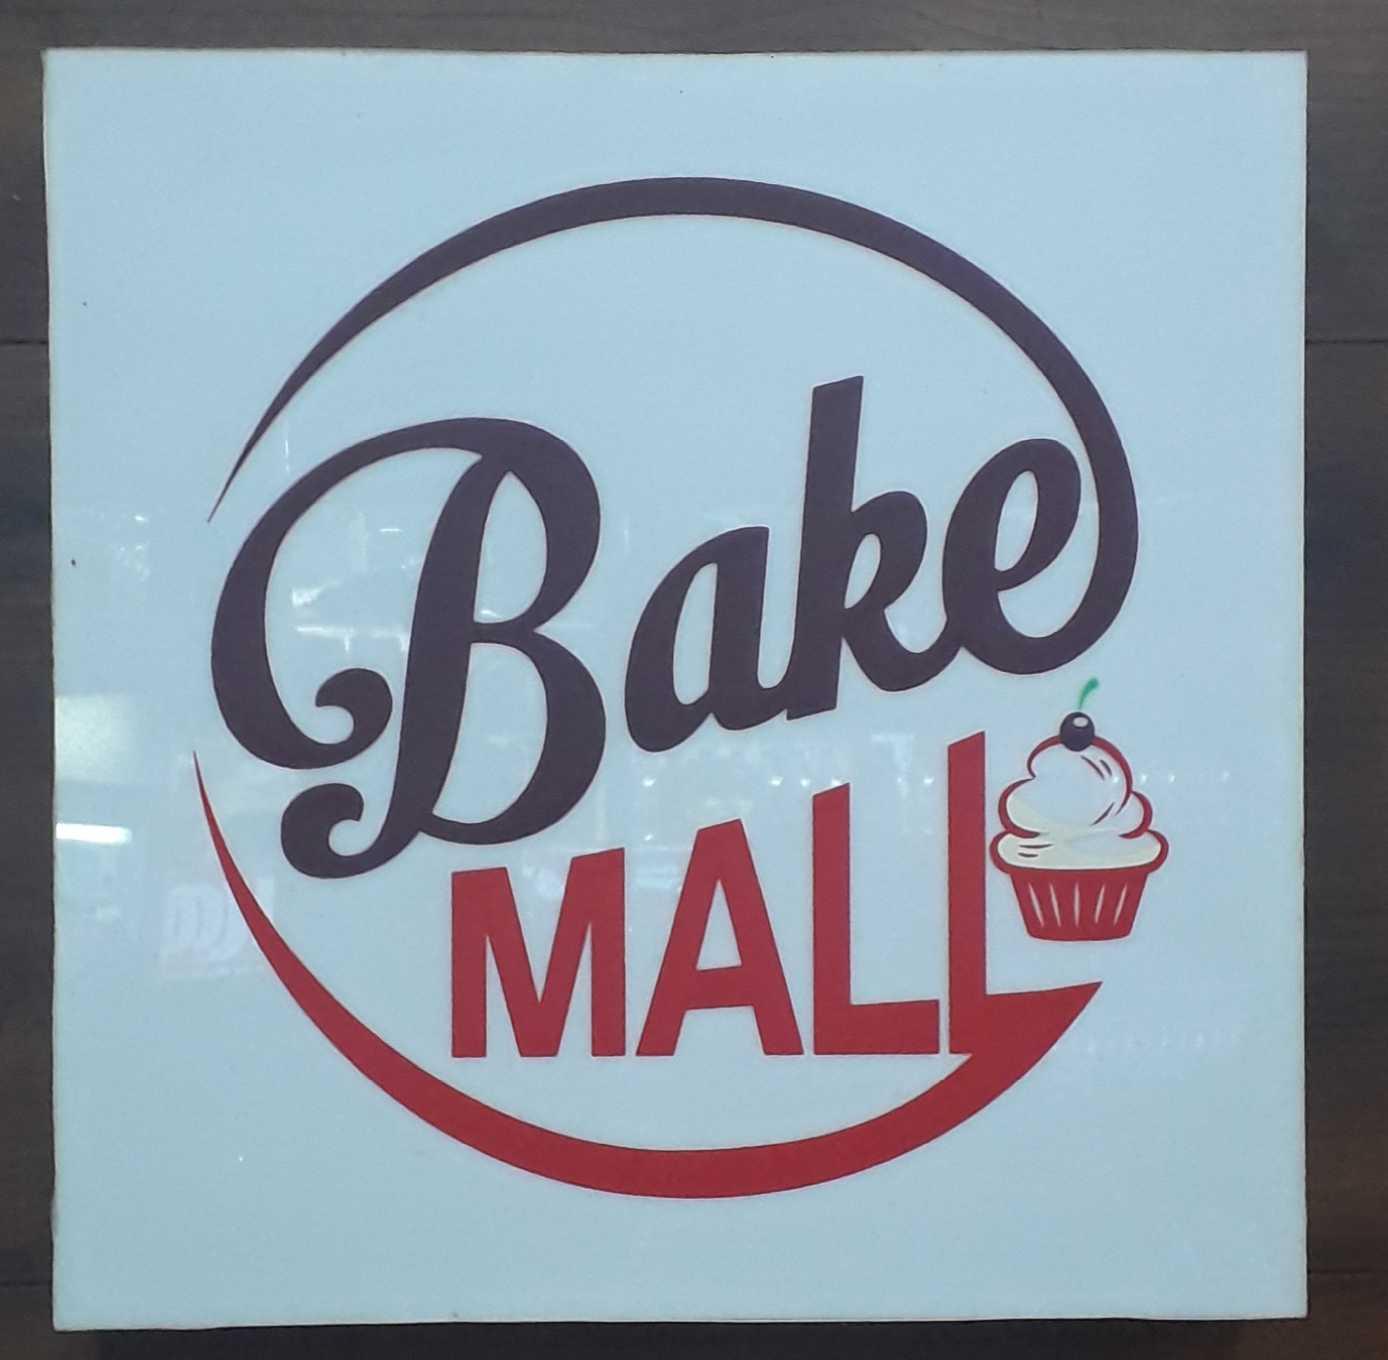 BAKE MALL, BAKERIES,  service in Cheruvannur, Kozhikode